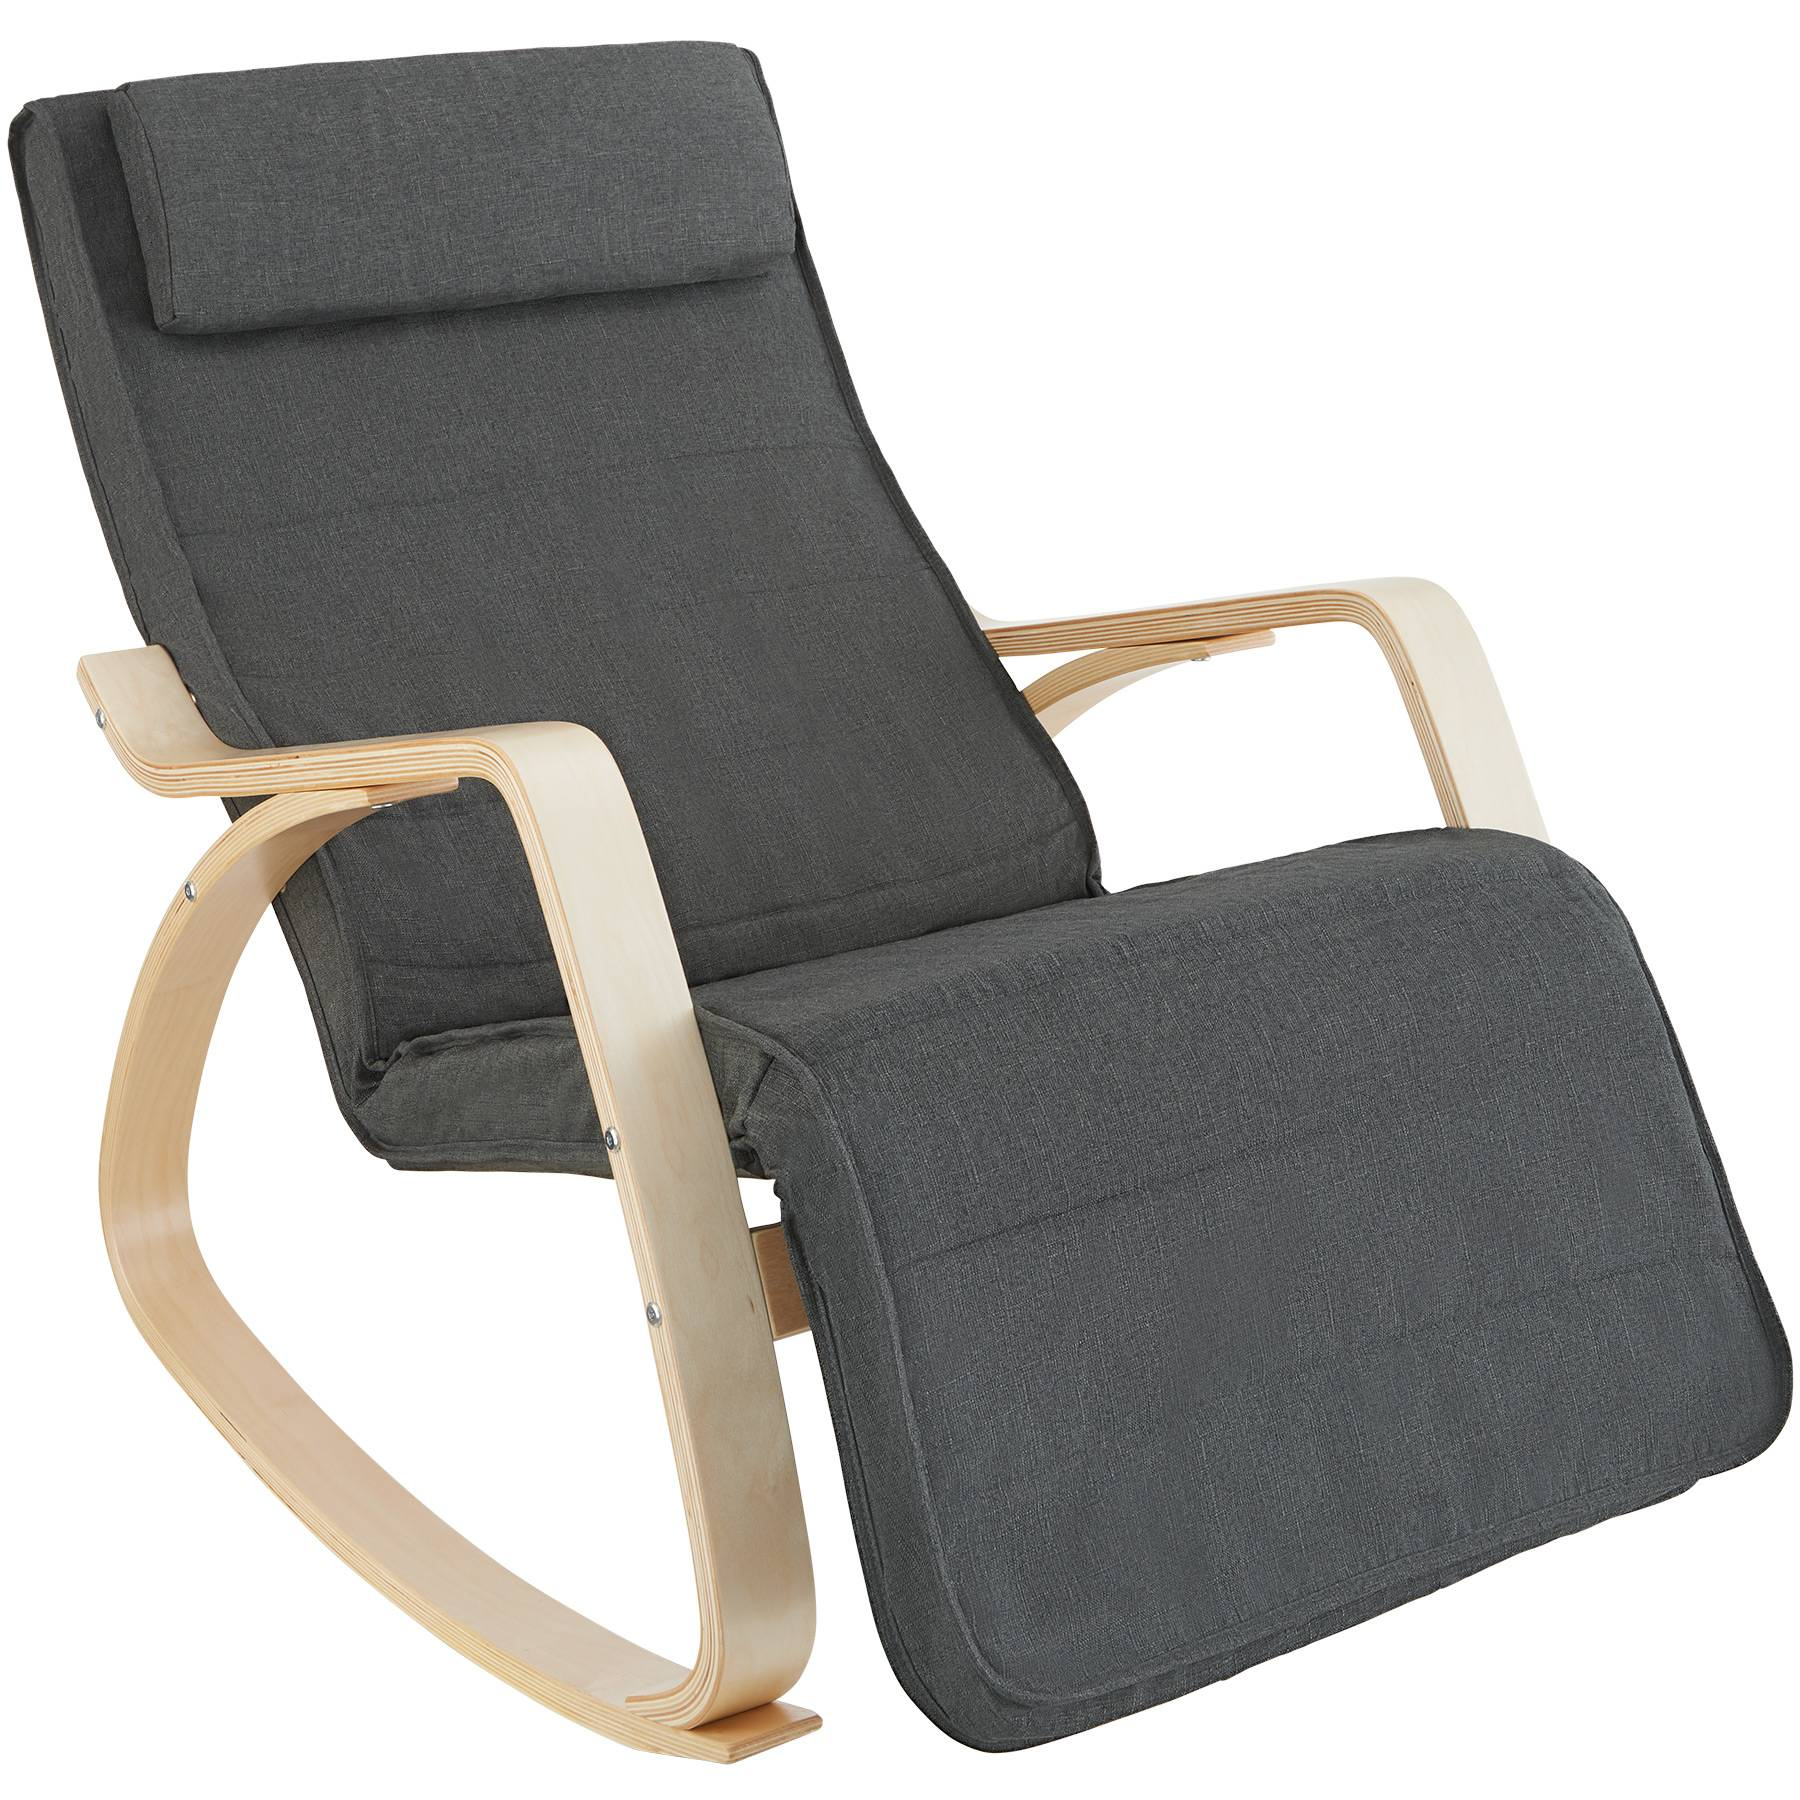 tectake Onda Rocking Chair - dark grey